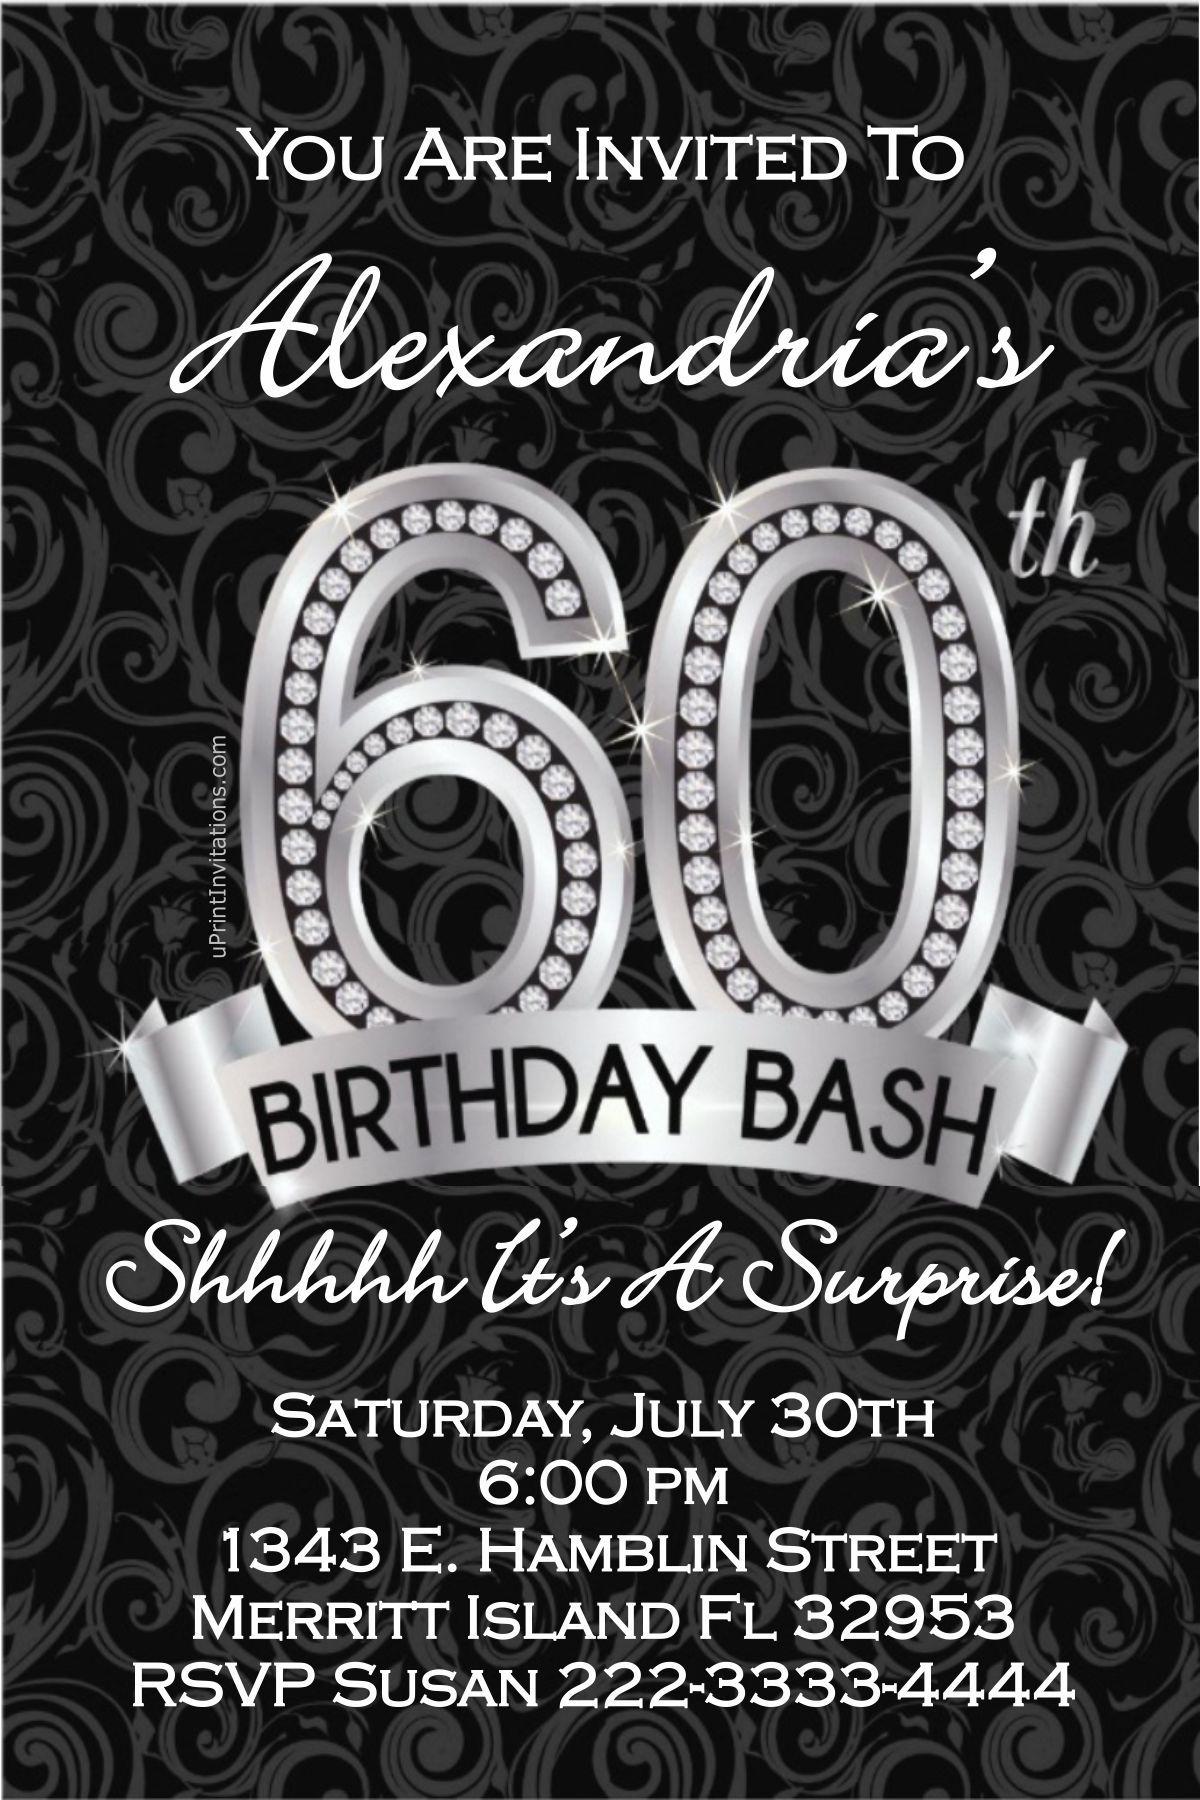 60th Birthday Invitations - Digital Download - Get these invitations ...